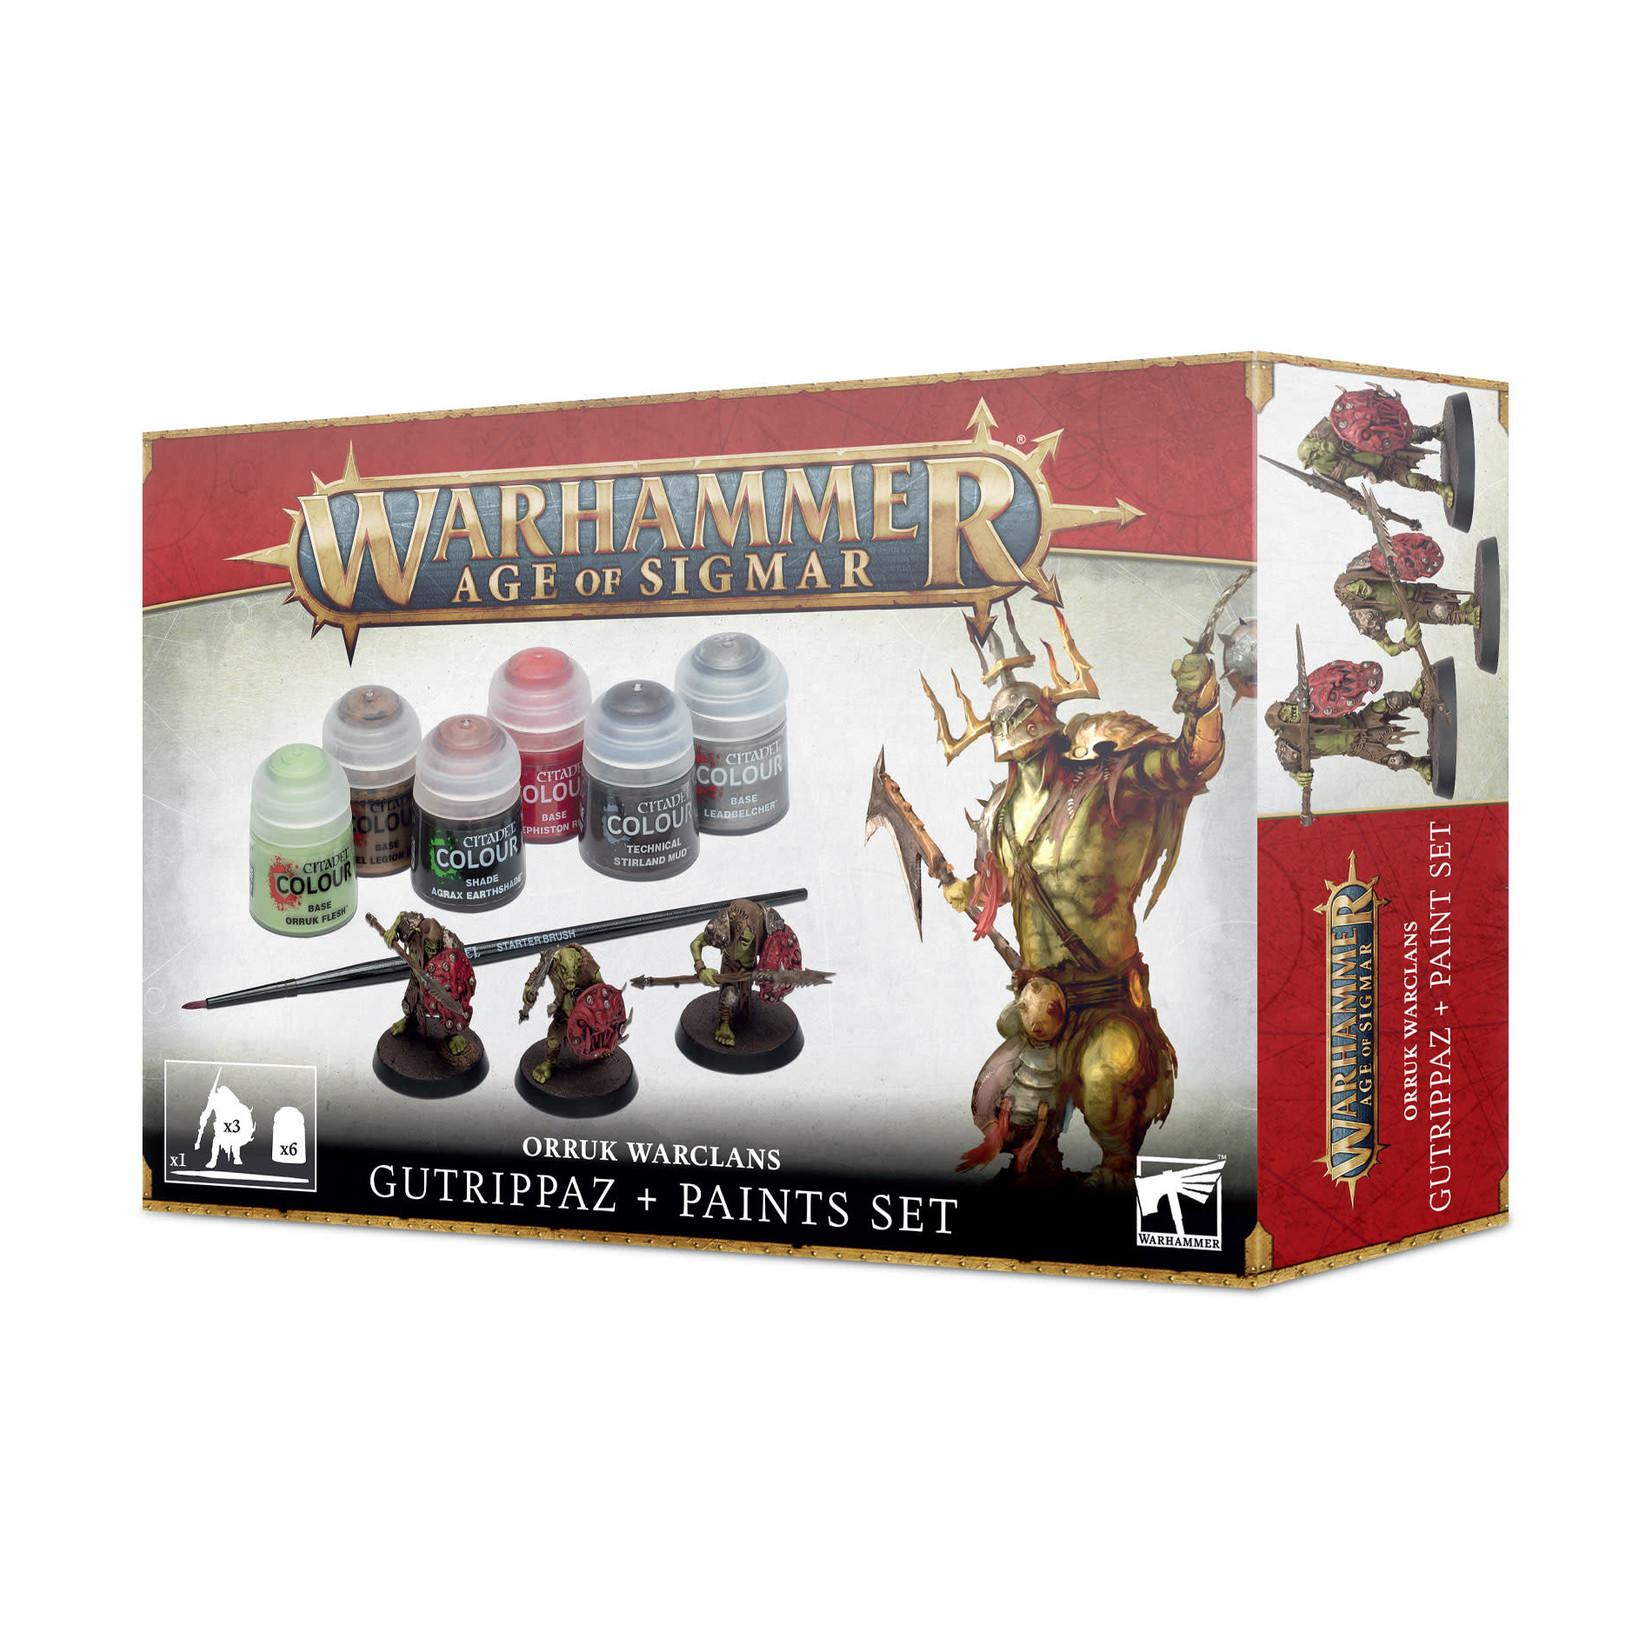 Games Workshop Warhammer Age of Sigmar: Orruk Warclans - Gutrippaz + Paints Set